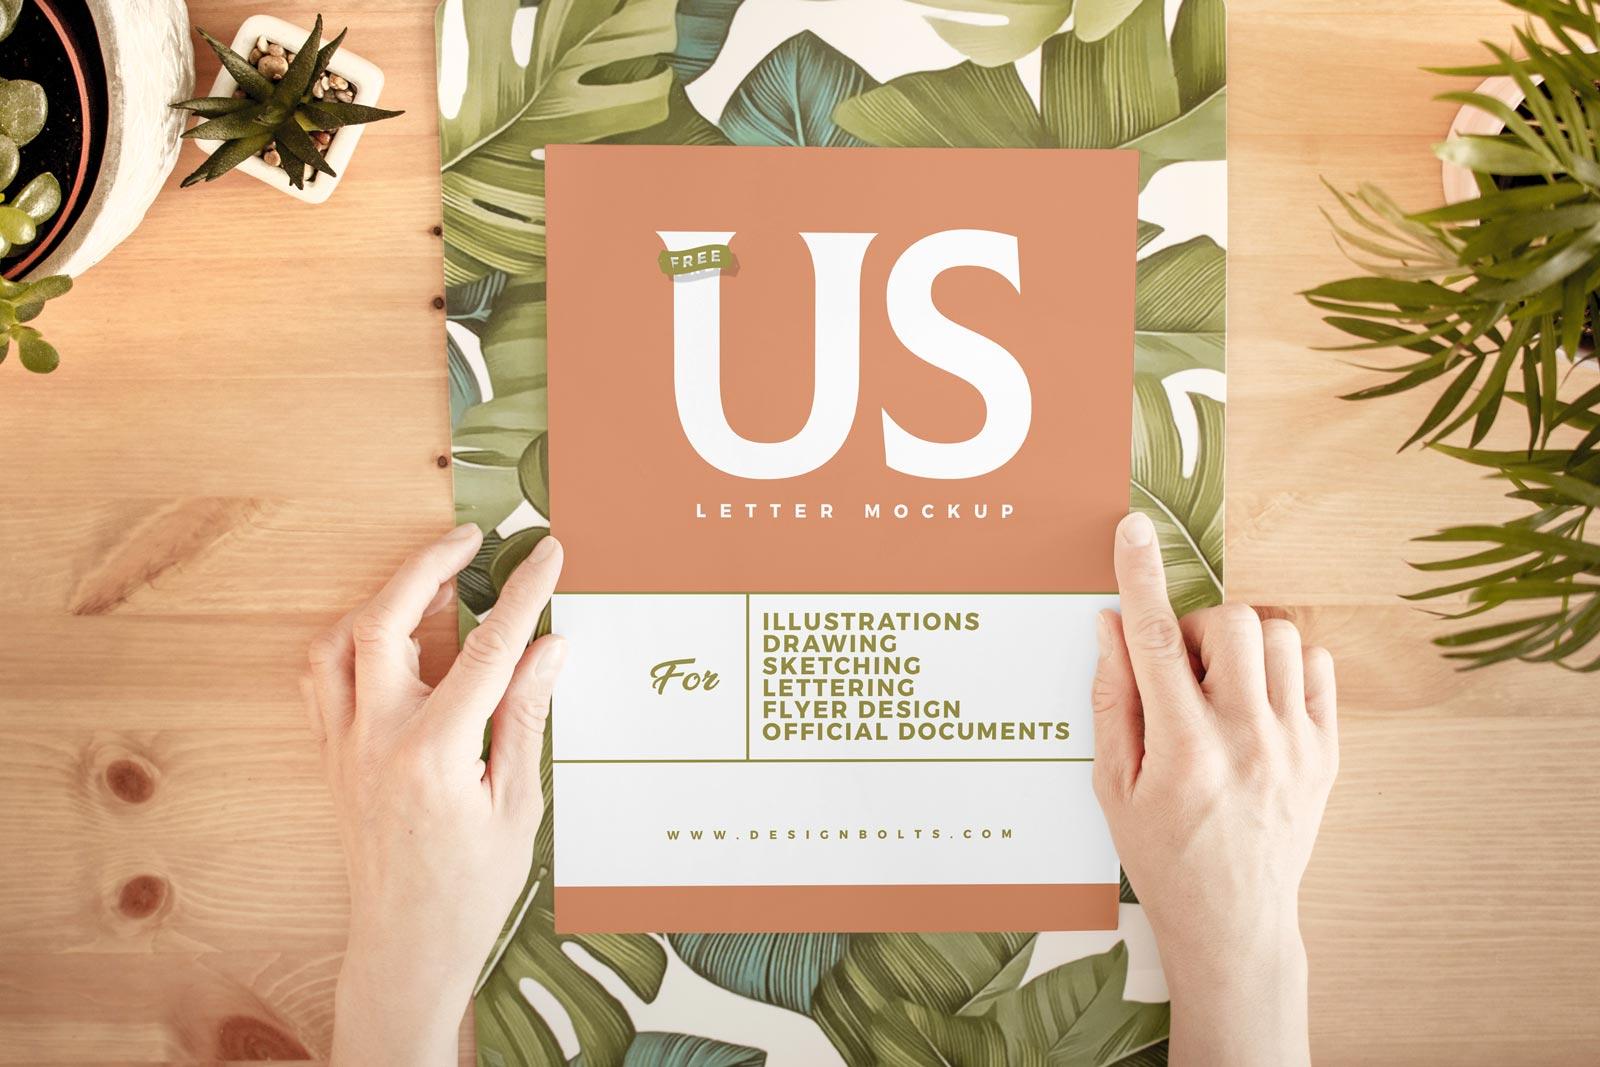 Free Hand Holding White Us Letter Paper Mockup Psd Designbolts